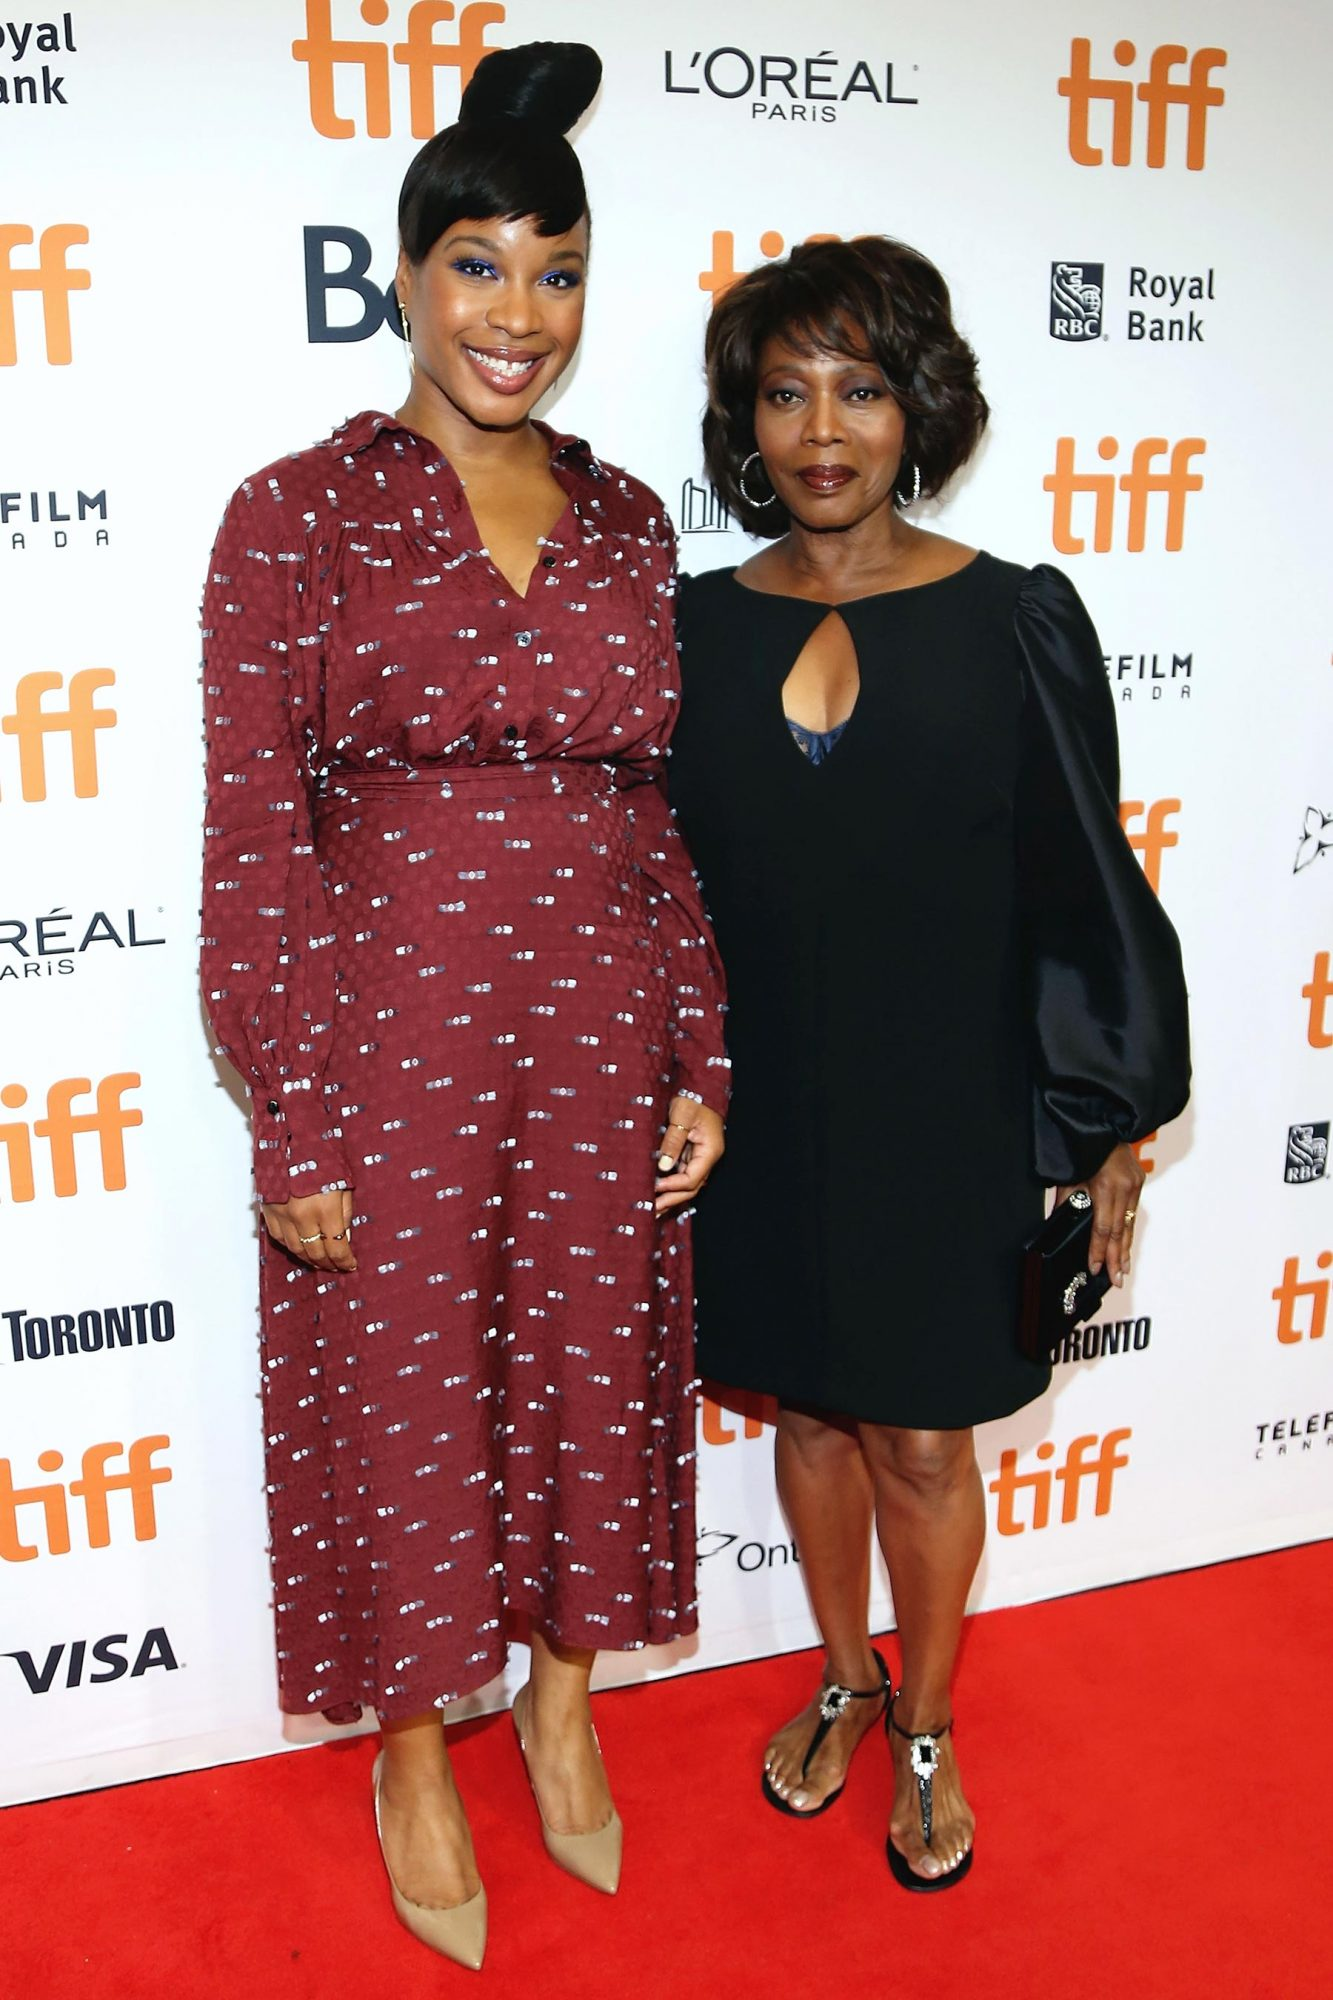 2019 Toronto International Film Festival